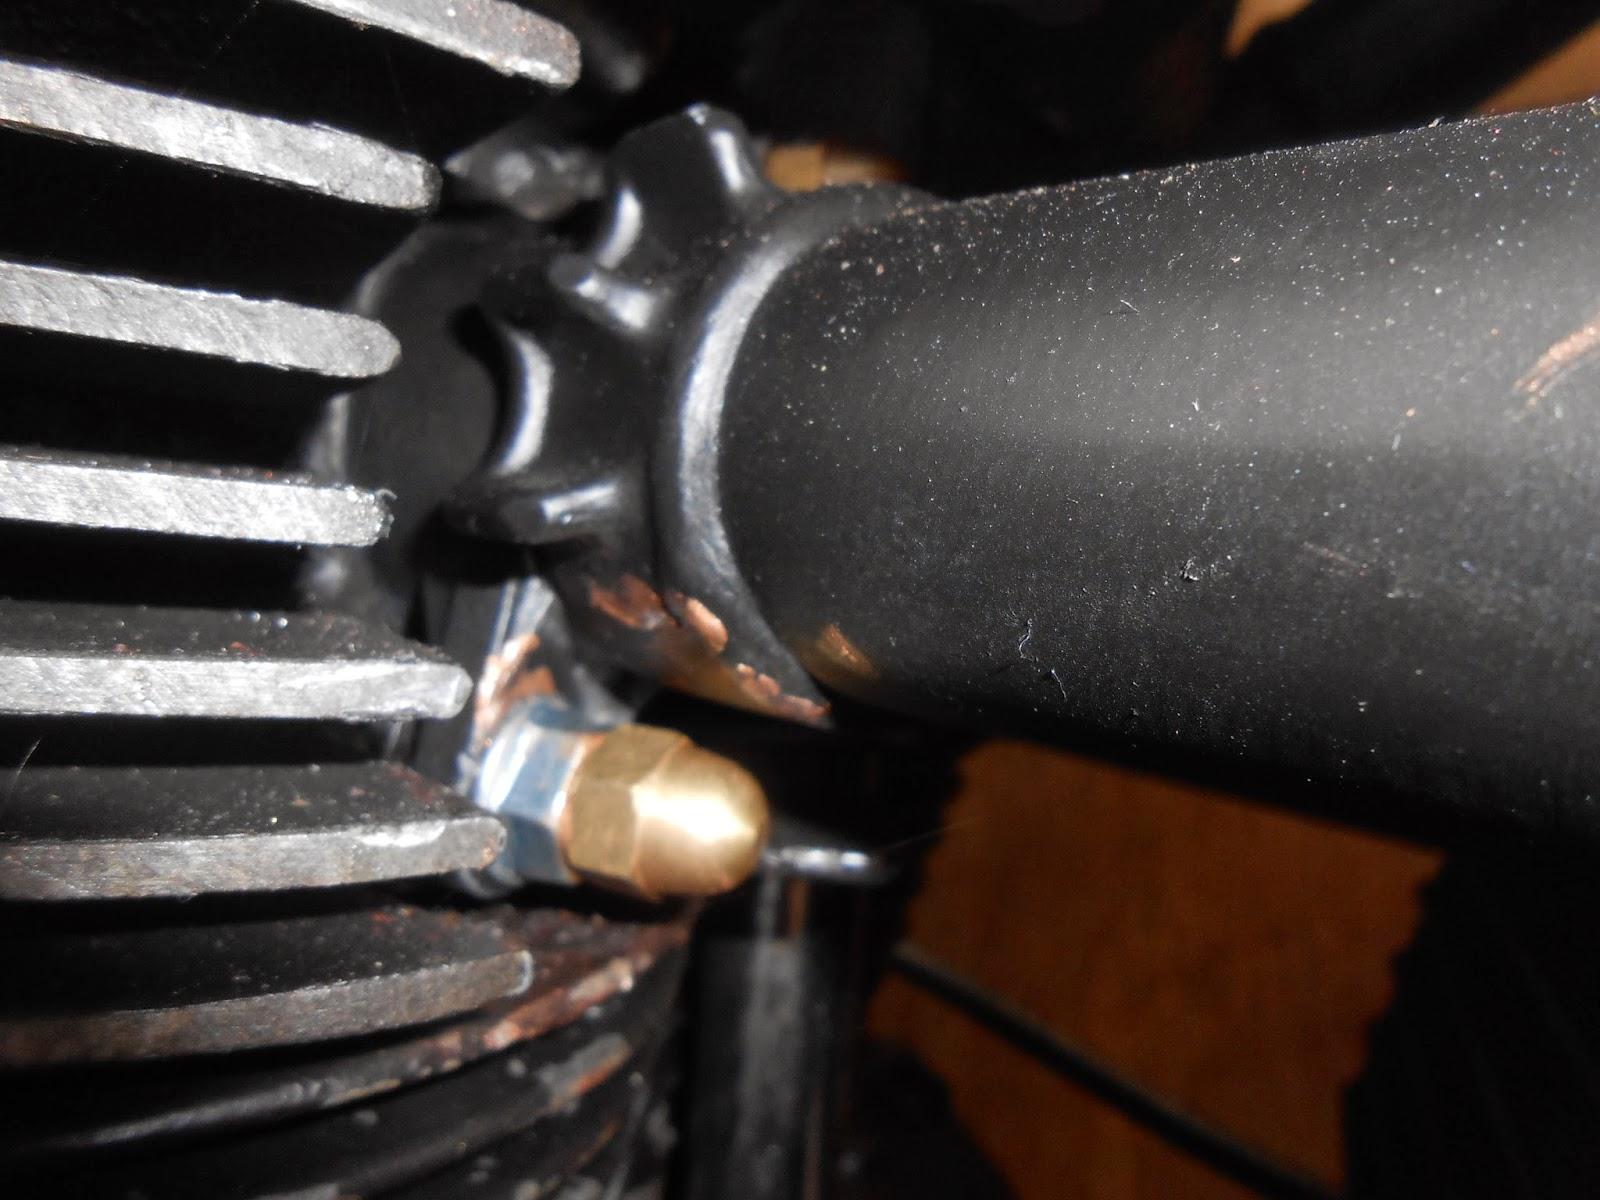 jebustown motorcycles: Triumph Bonneville exhaust studs sorted